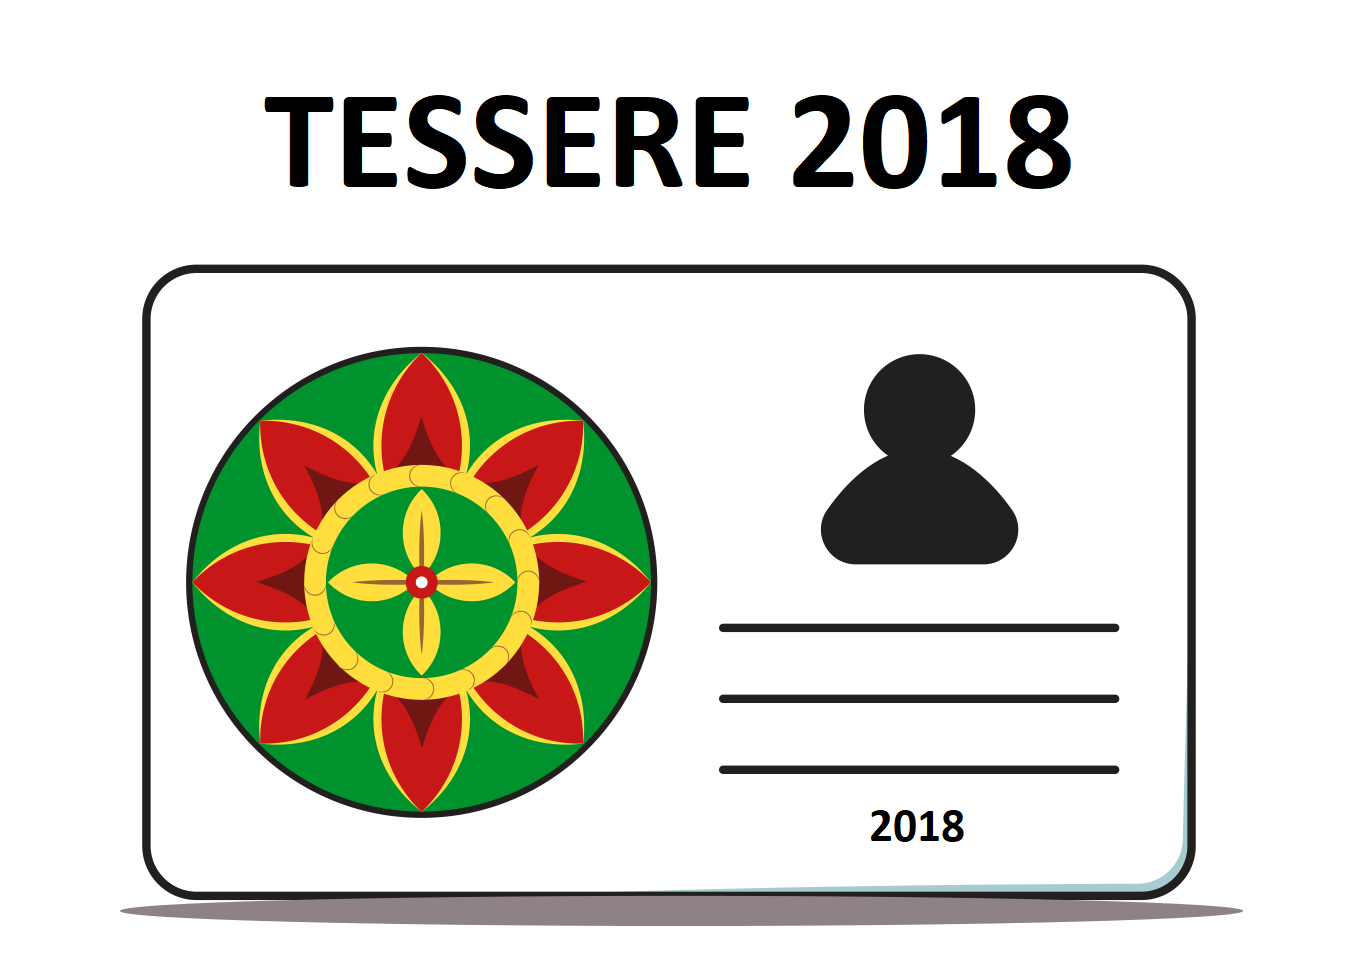 Tessere2018